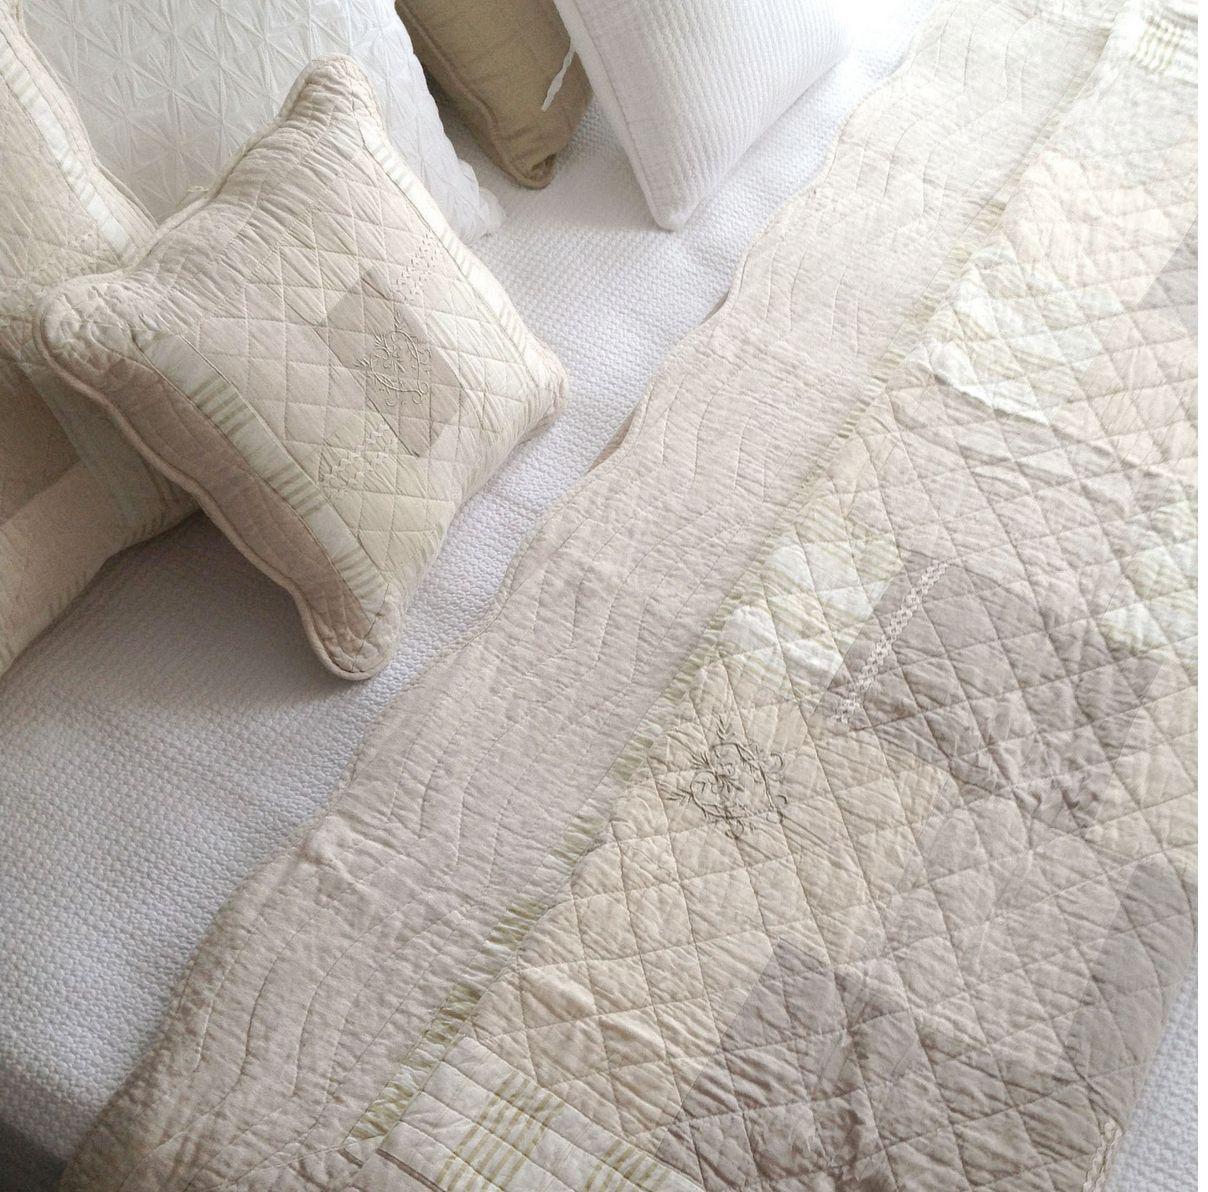 King Size Linen Quilt